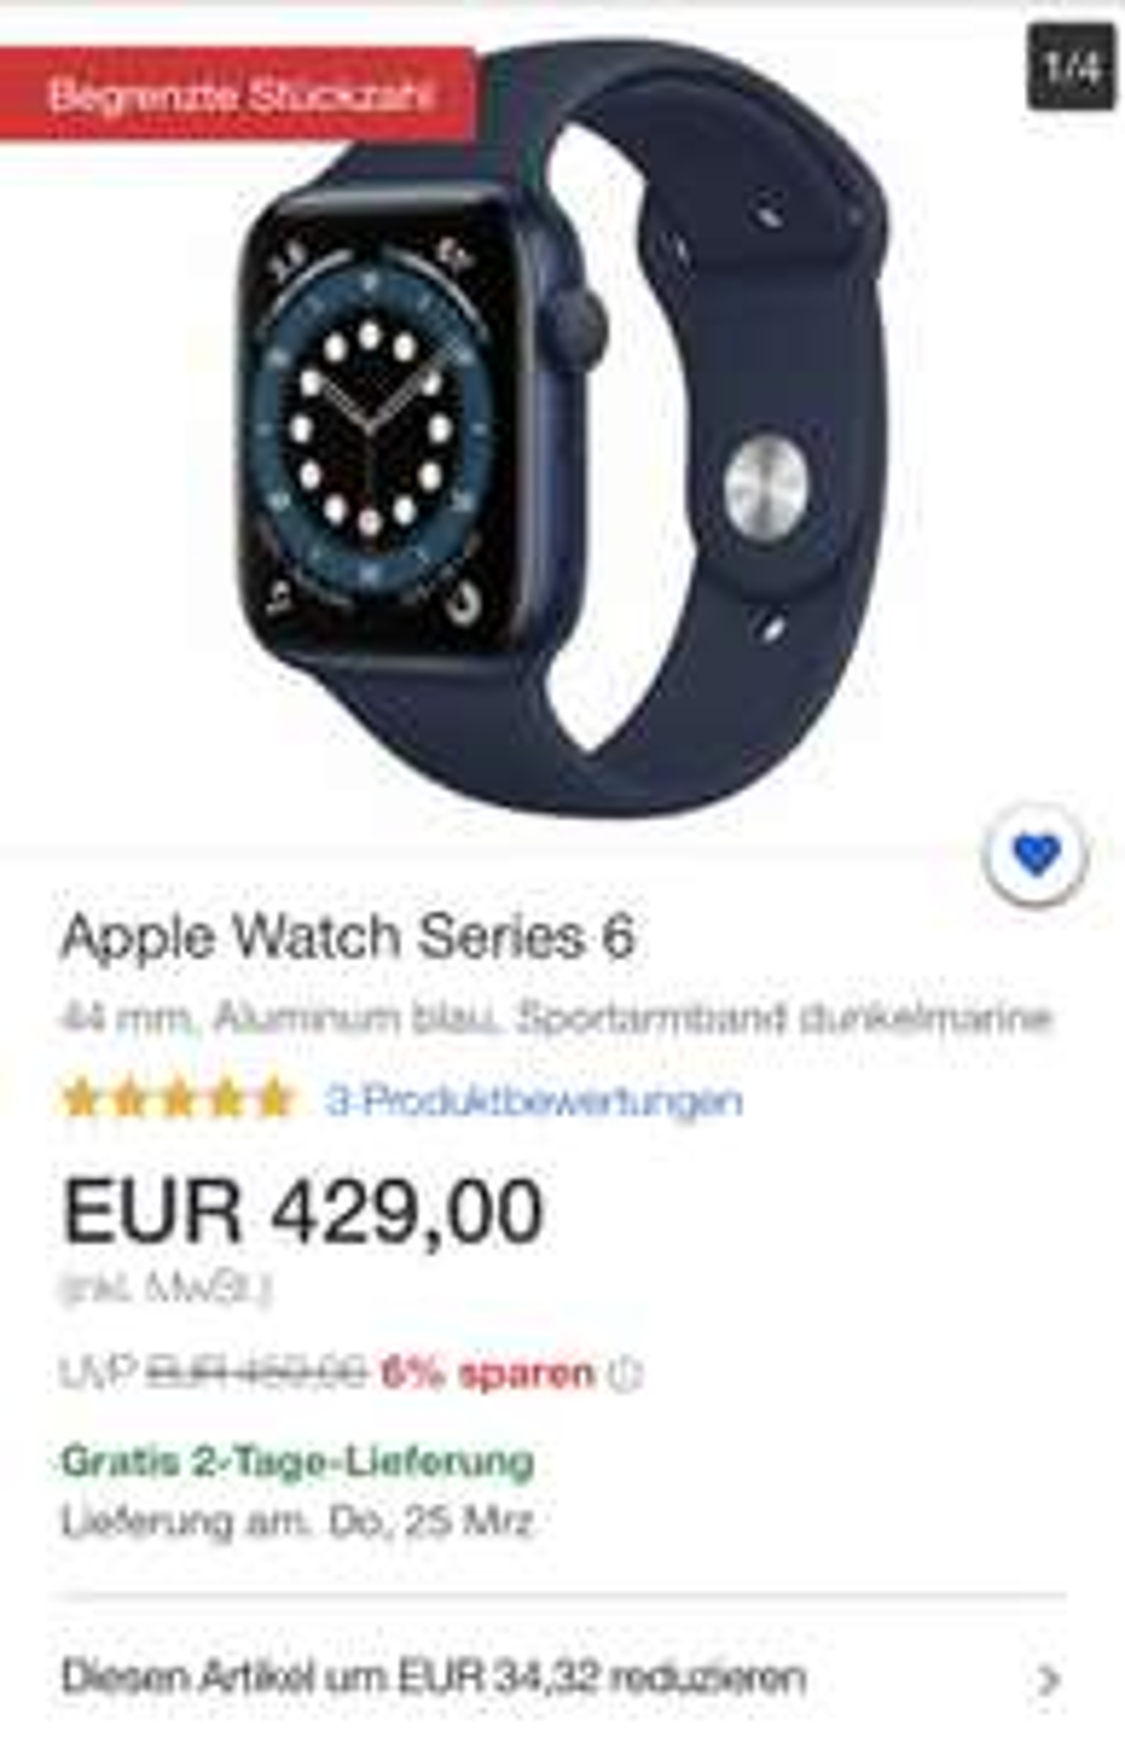 Ebay (Gravis) Apple Watch Series 6 (44mm in blau)